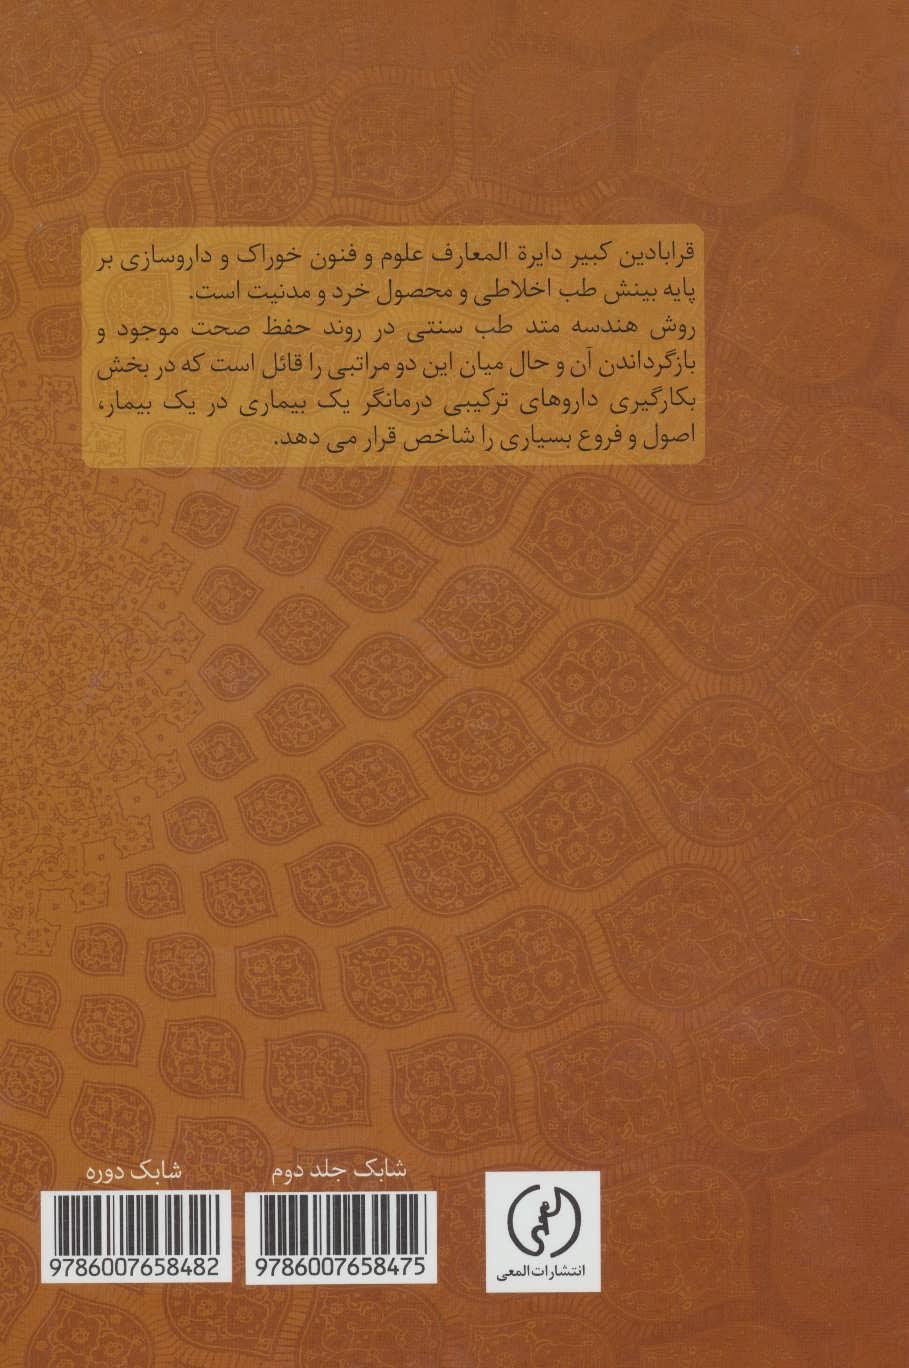 قرابادین کبیر (قرابادین مجمع الجوامع و ذخائر التراکیب)،(2جلدی)